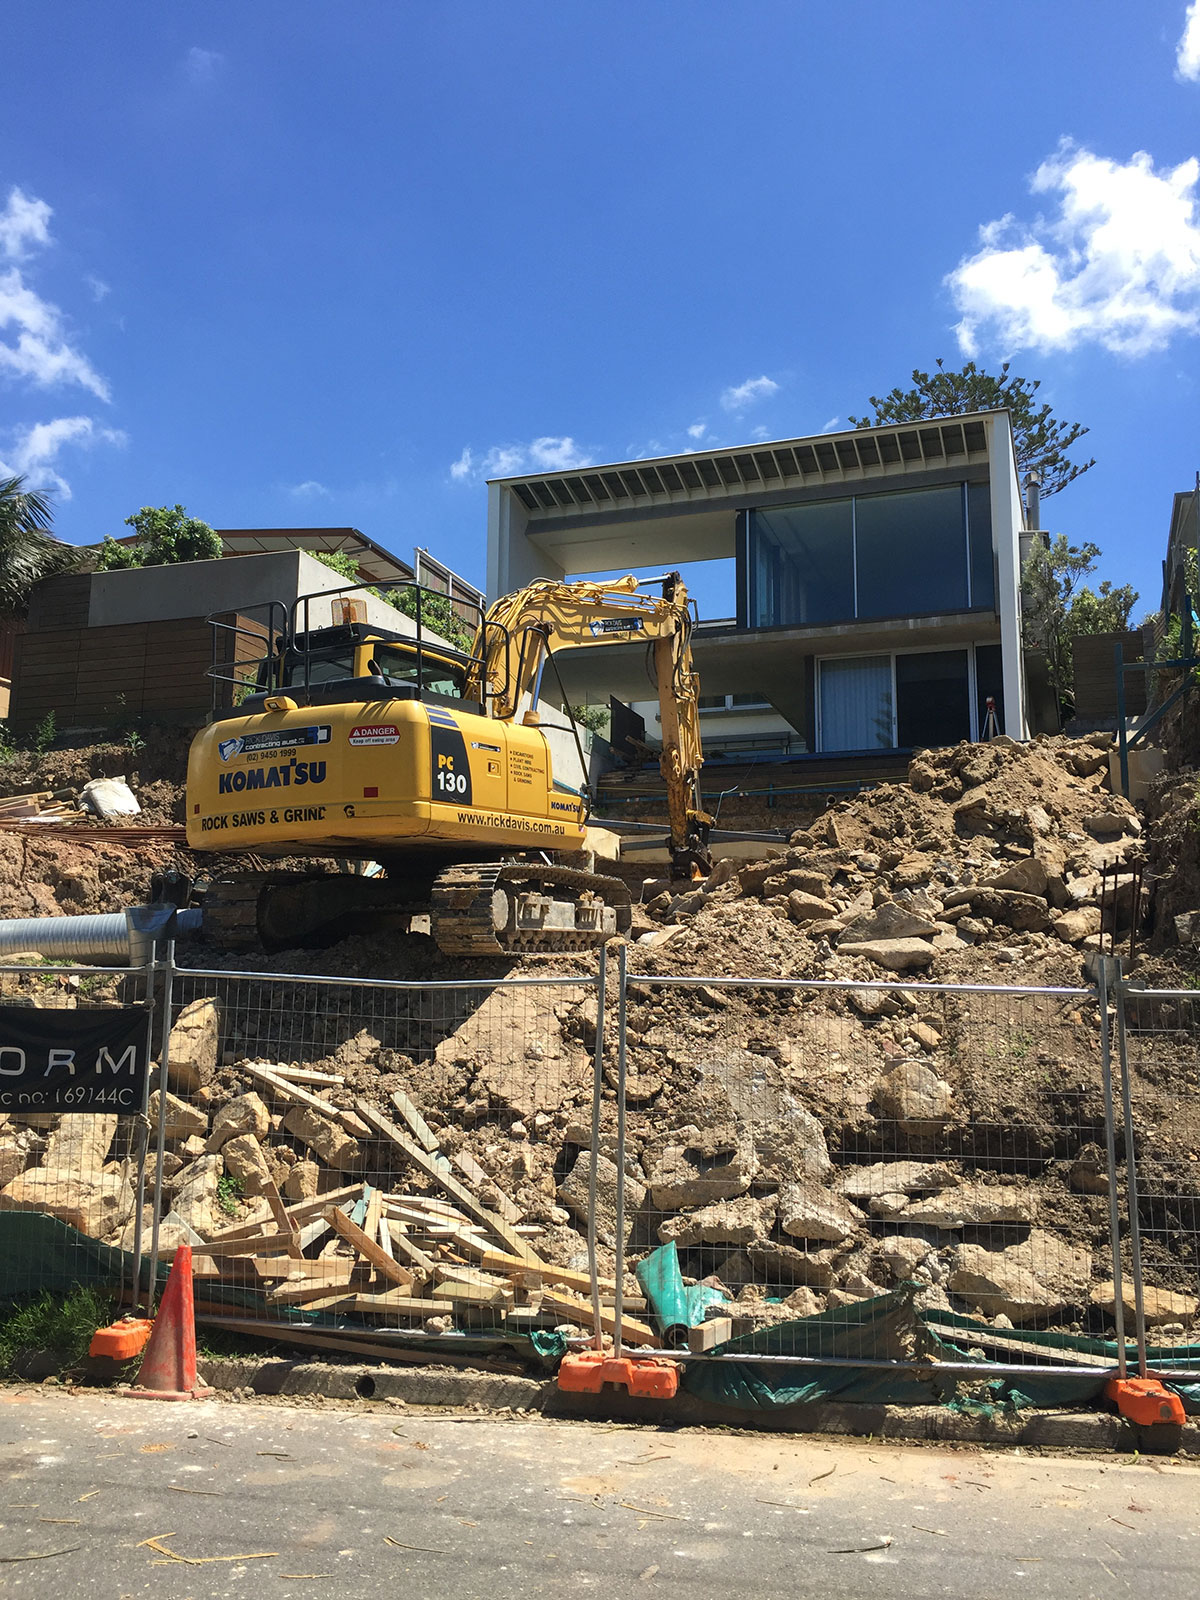 Rick-Davis-Contracting-Excavation-Site-Excavator-Hire-Sydney